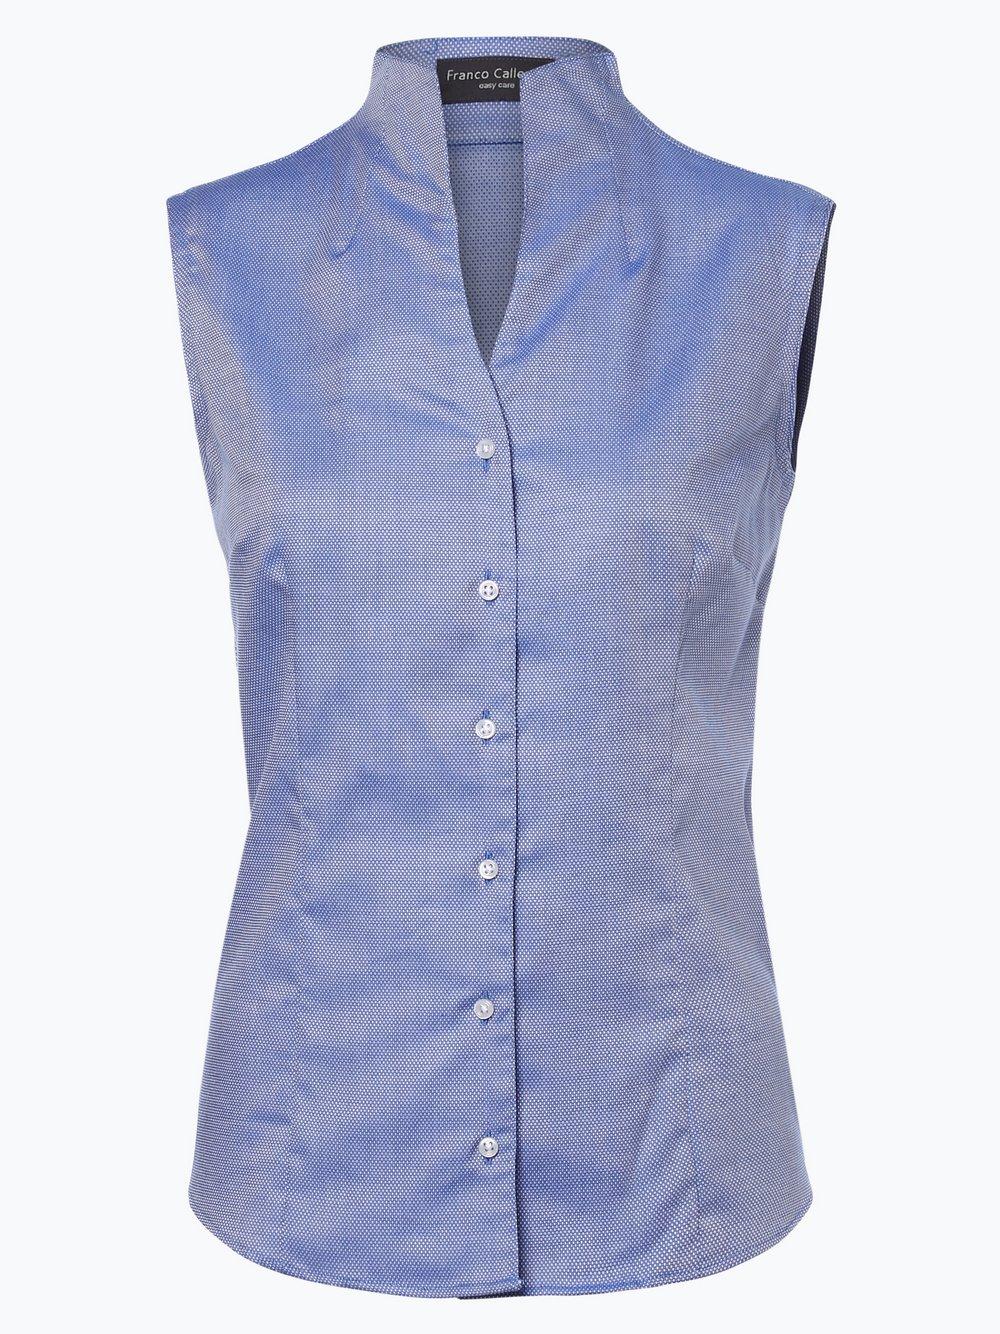 Franco Callegari - Bluzka damska łatwa w prasowaniu, niebieski